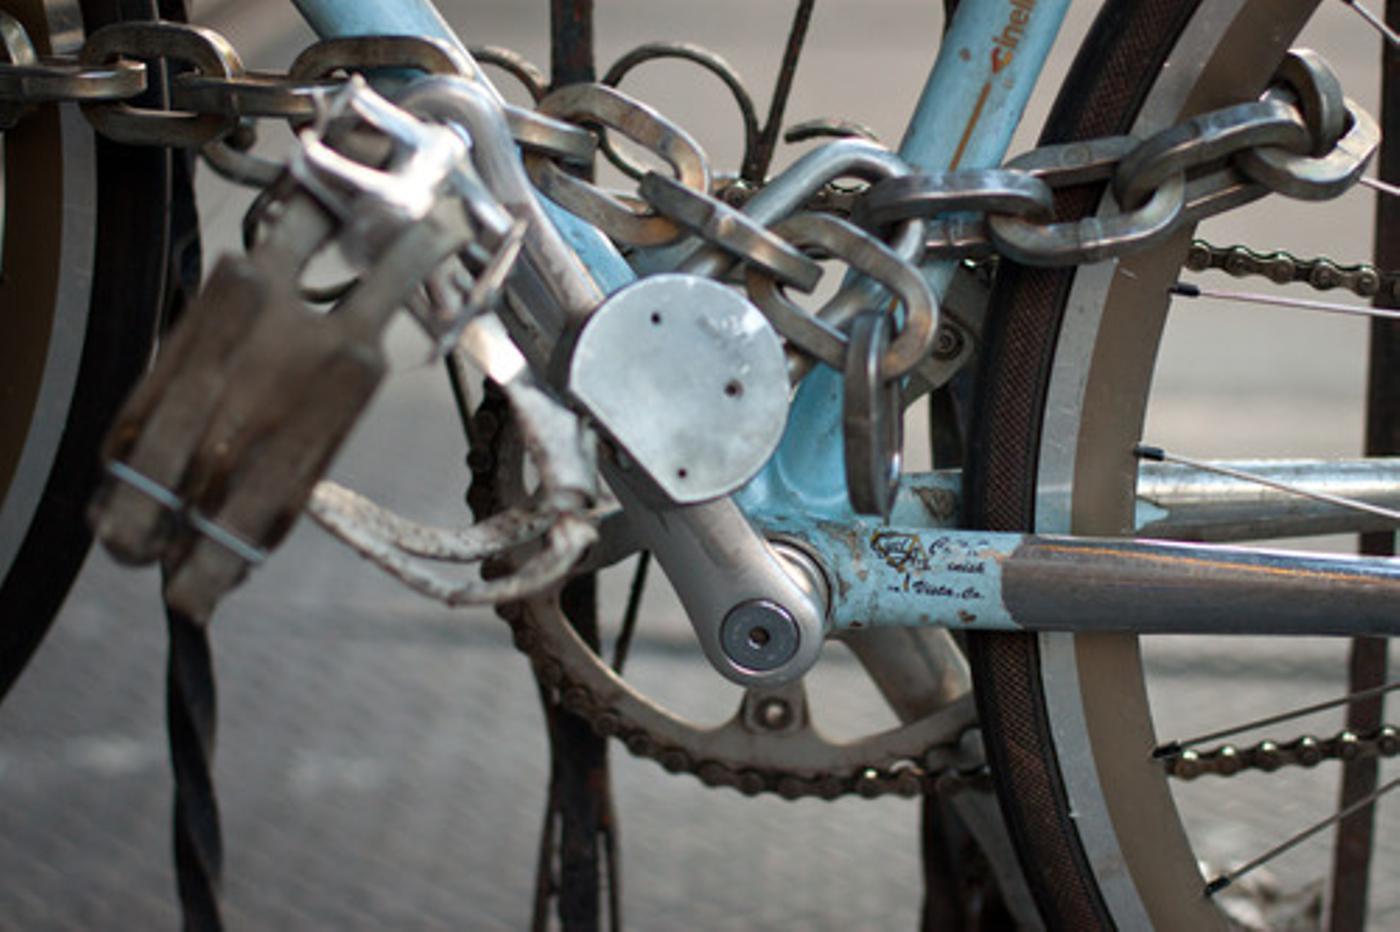 LockedUp-Cinelli-01-PINP.jpg